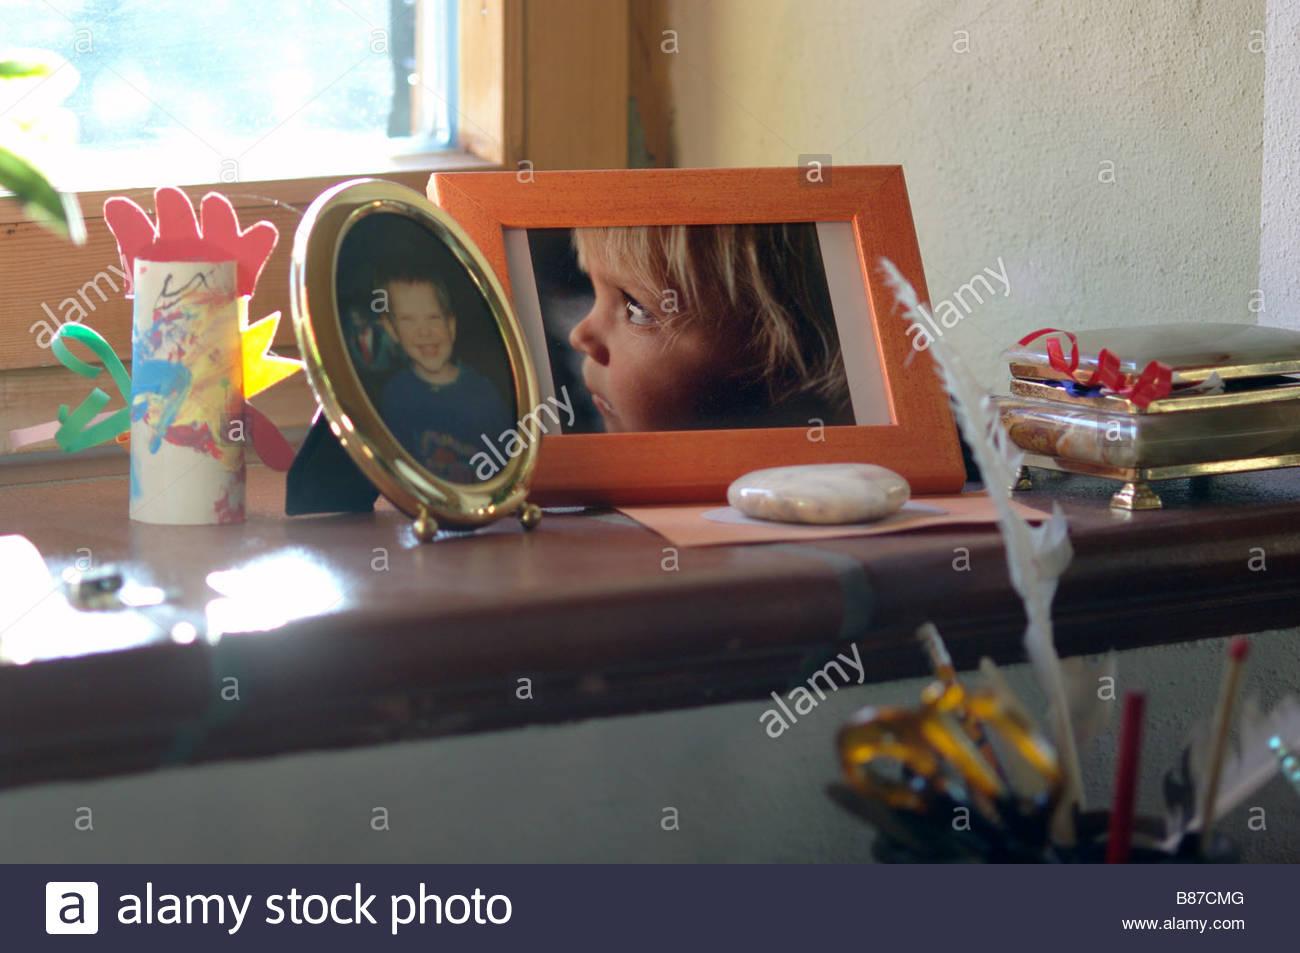 GRANDMAS MANTELPIECE MANTELPIECES  PHOTOS memories - Stock Image